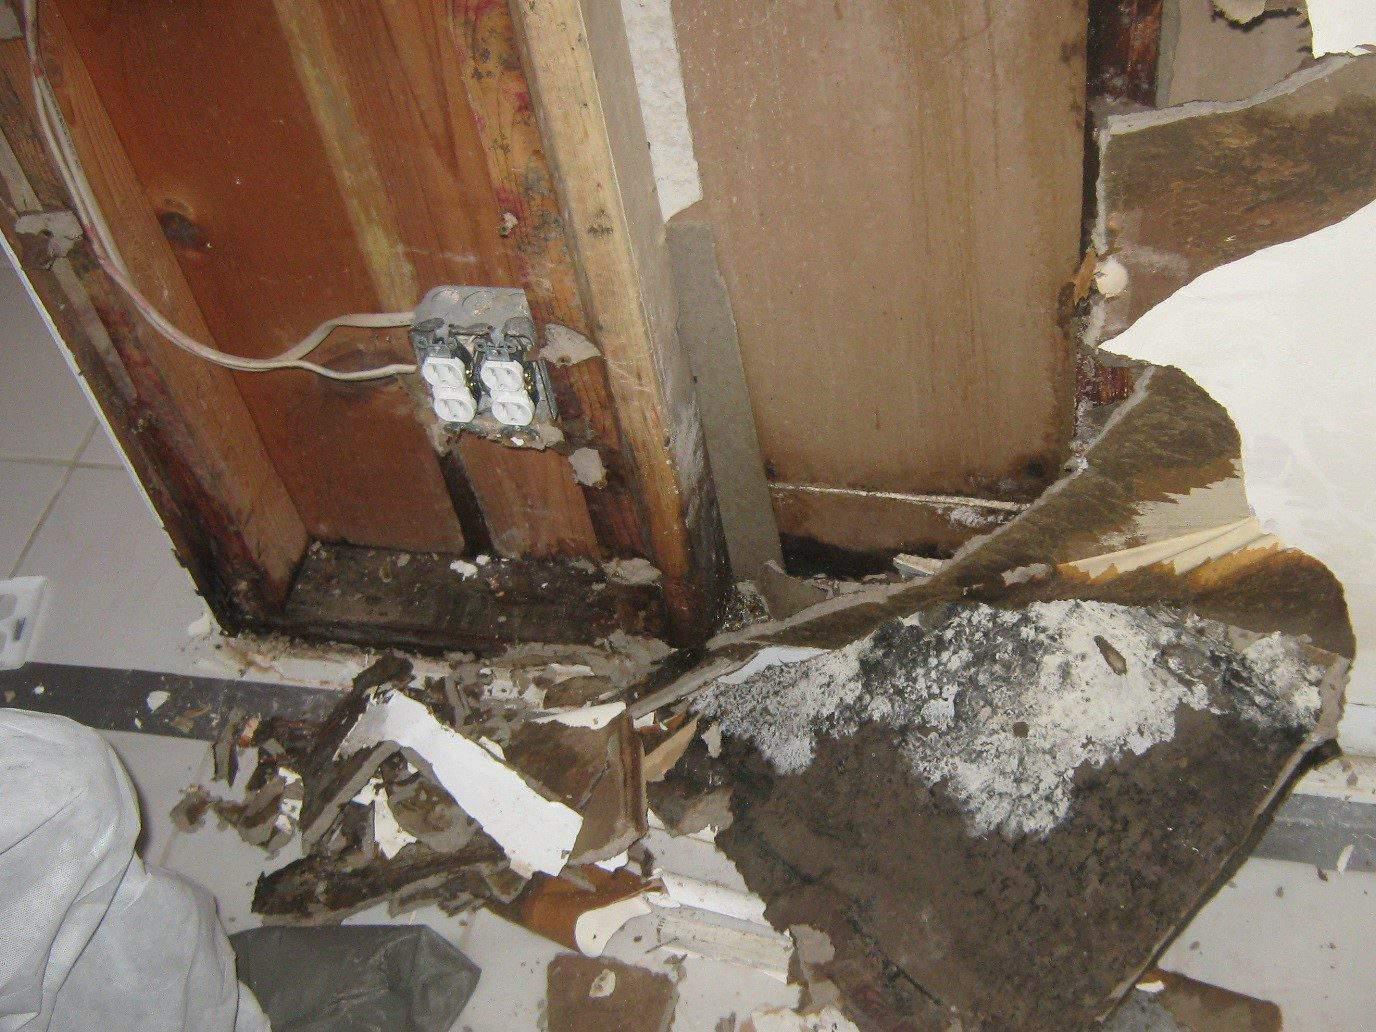 4. Valor Mold Removal - Mold Remediation In Basement- Arlington VA (During)